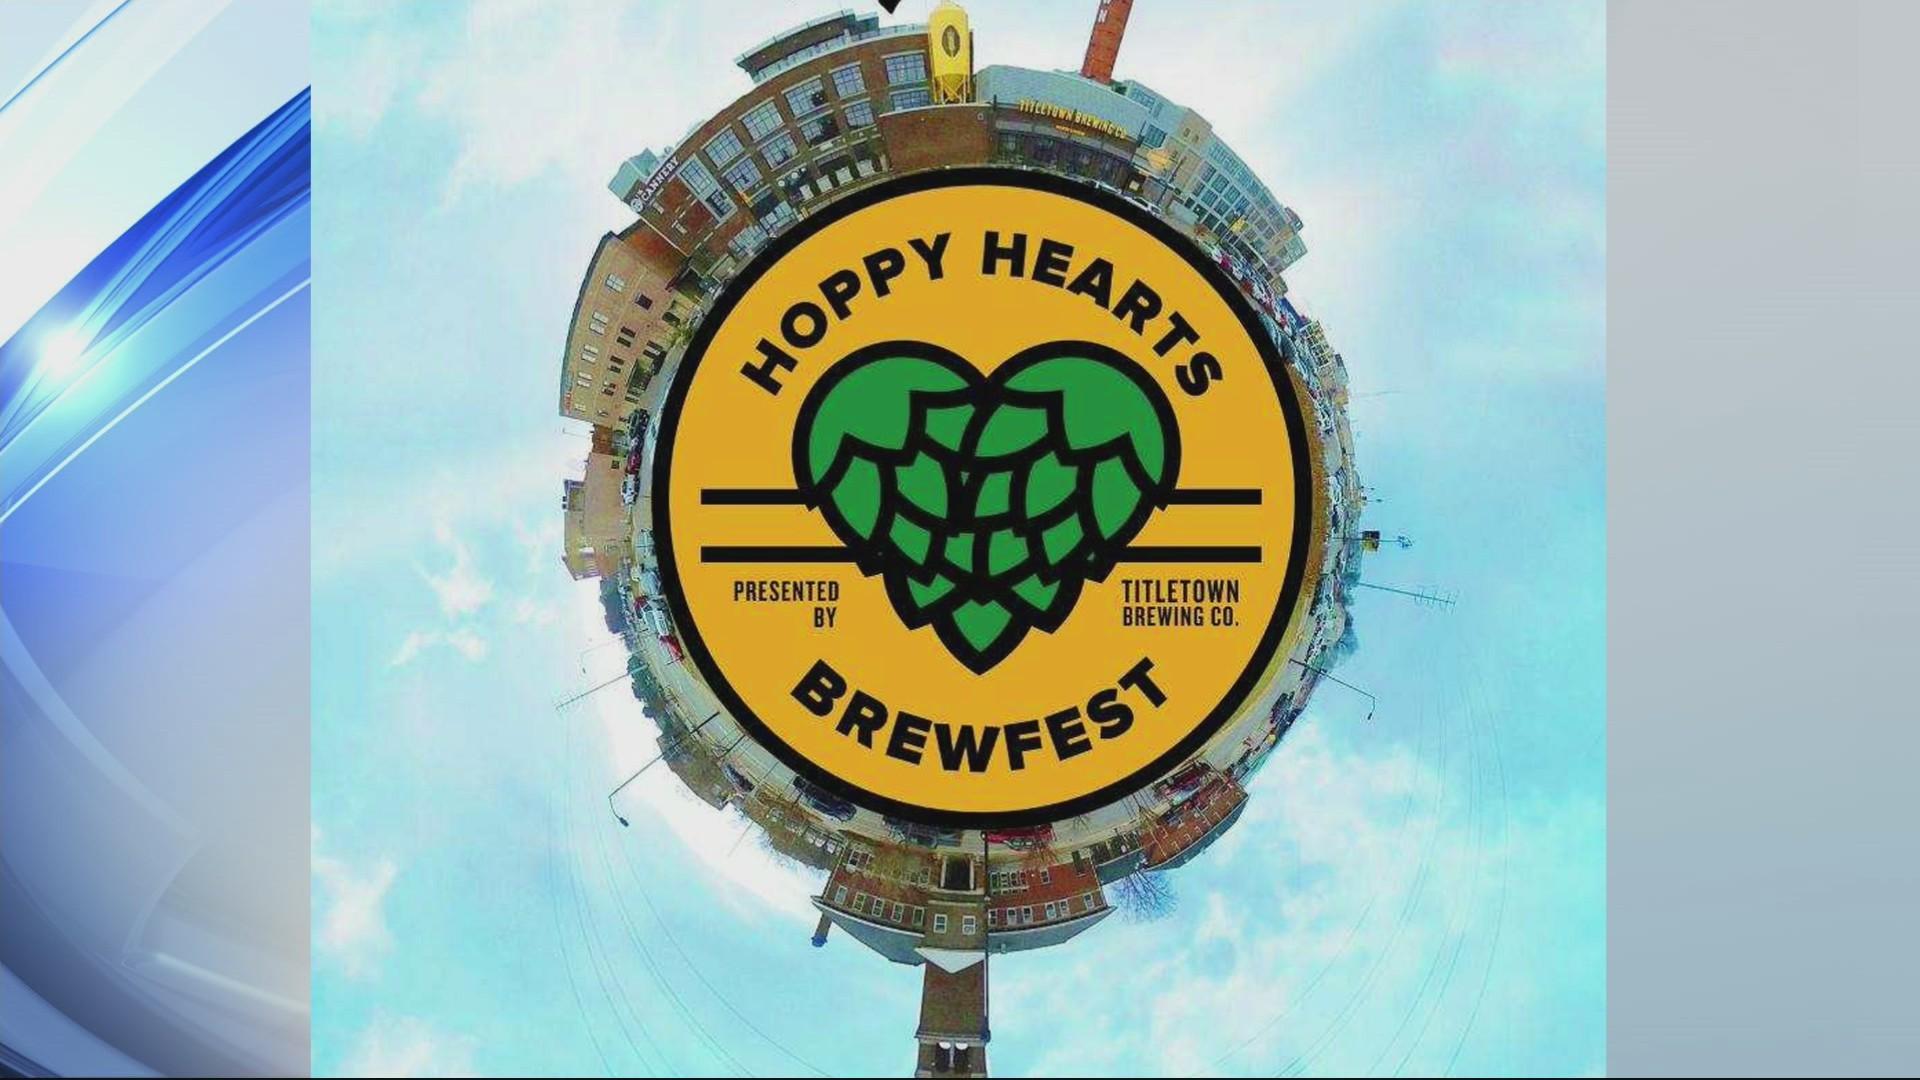 Hoppy Hearts Brewfest